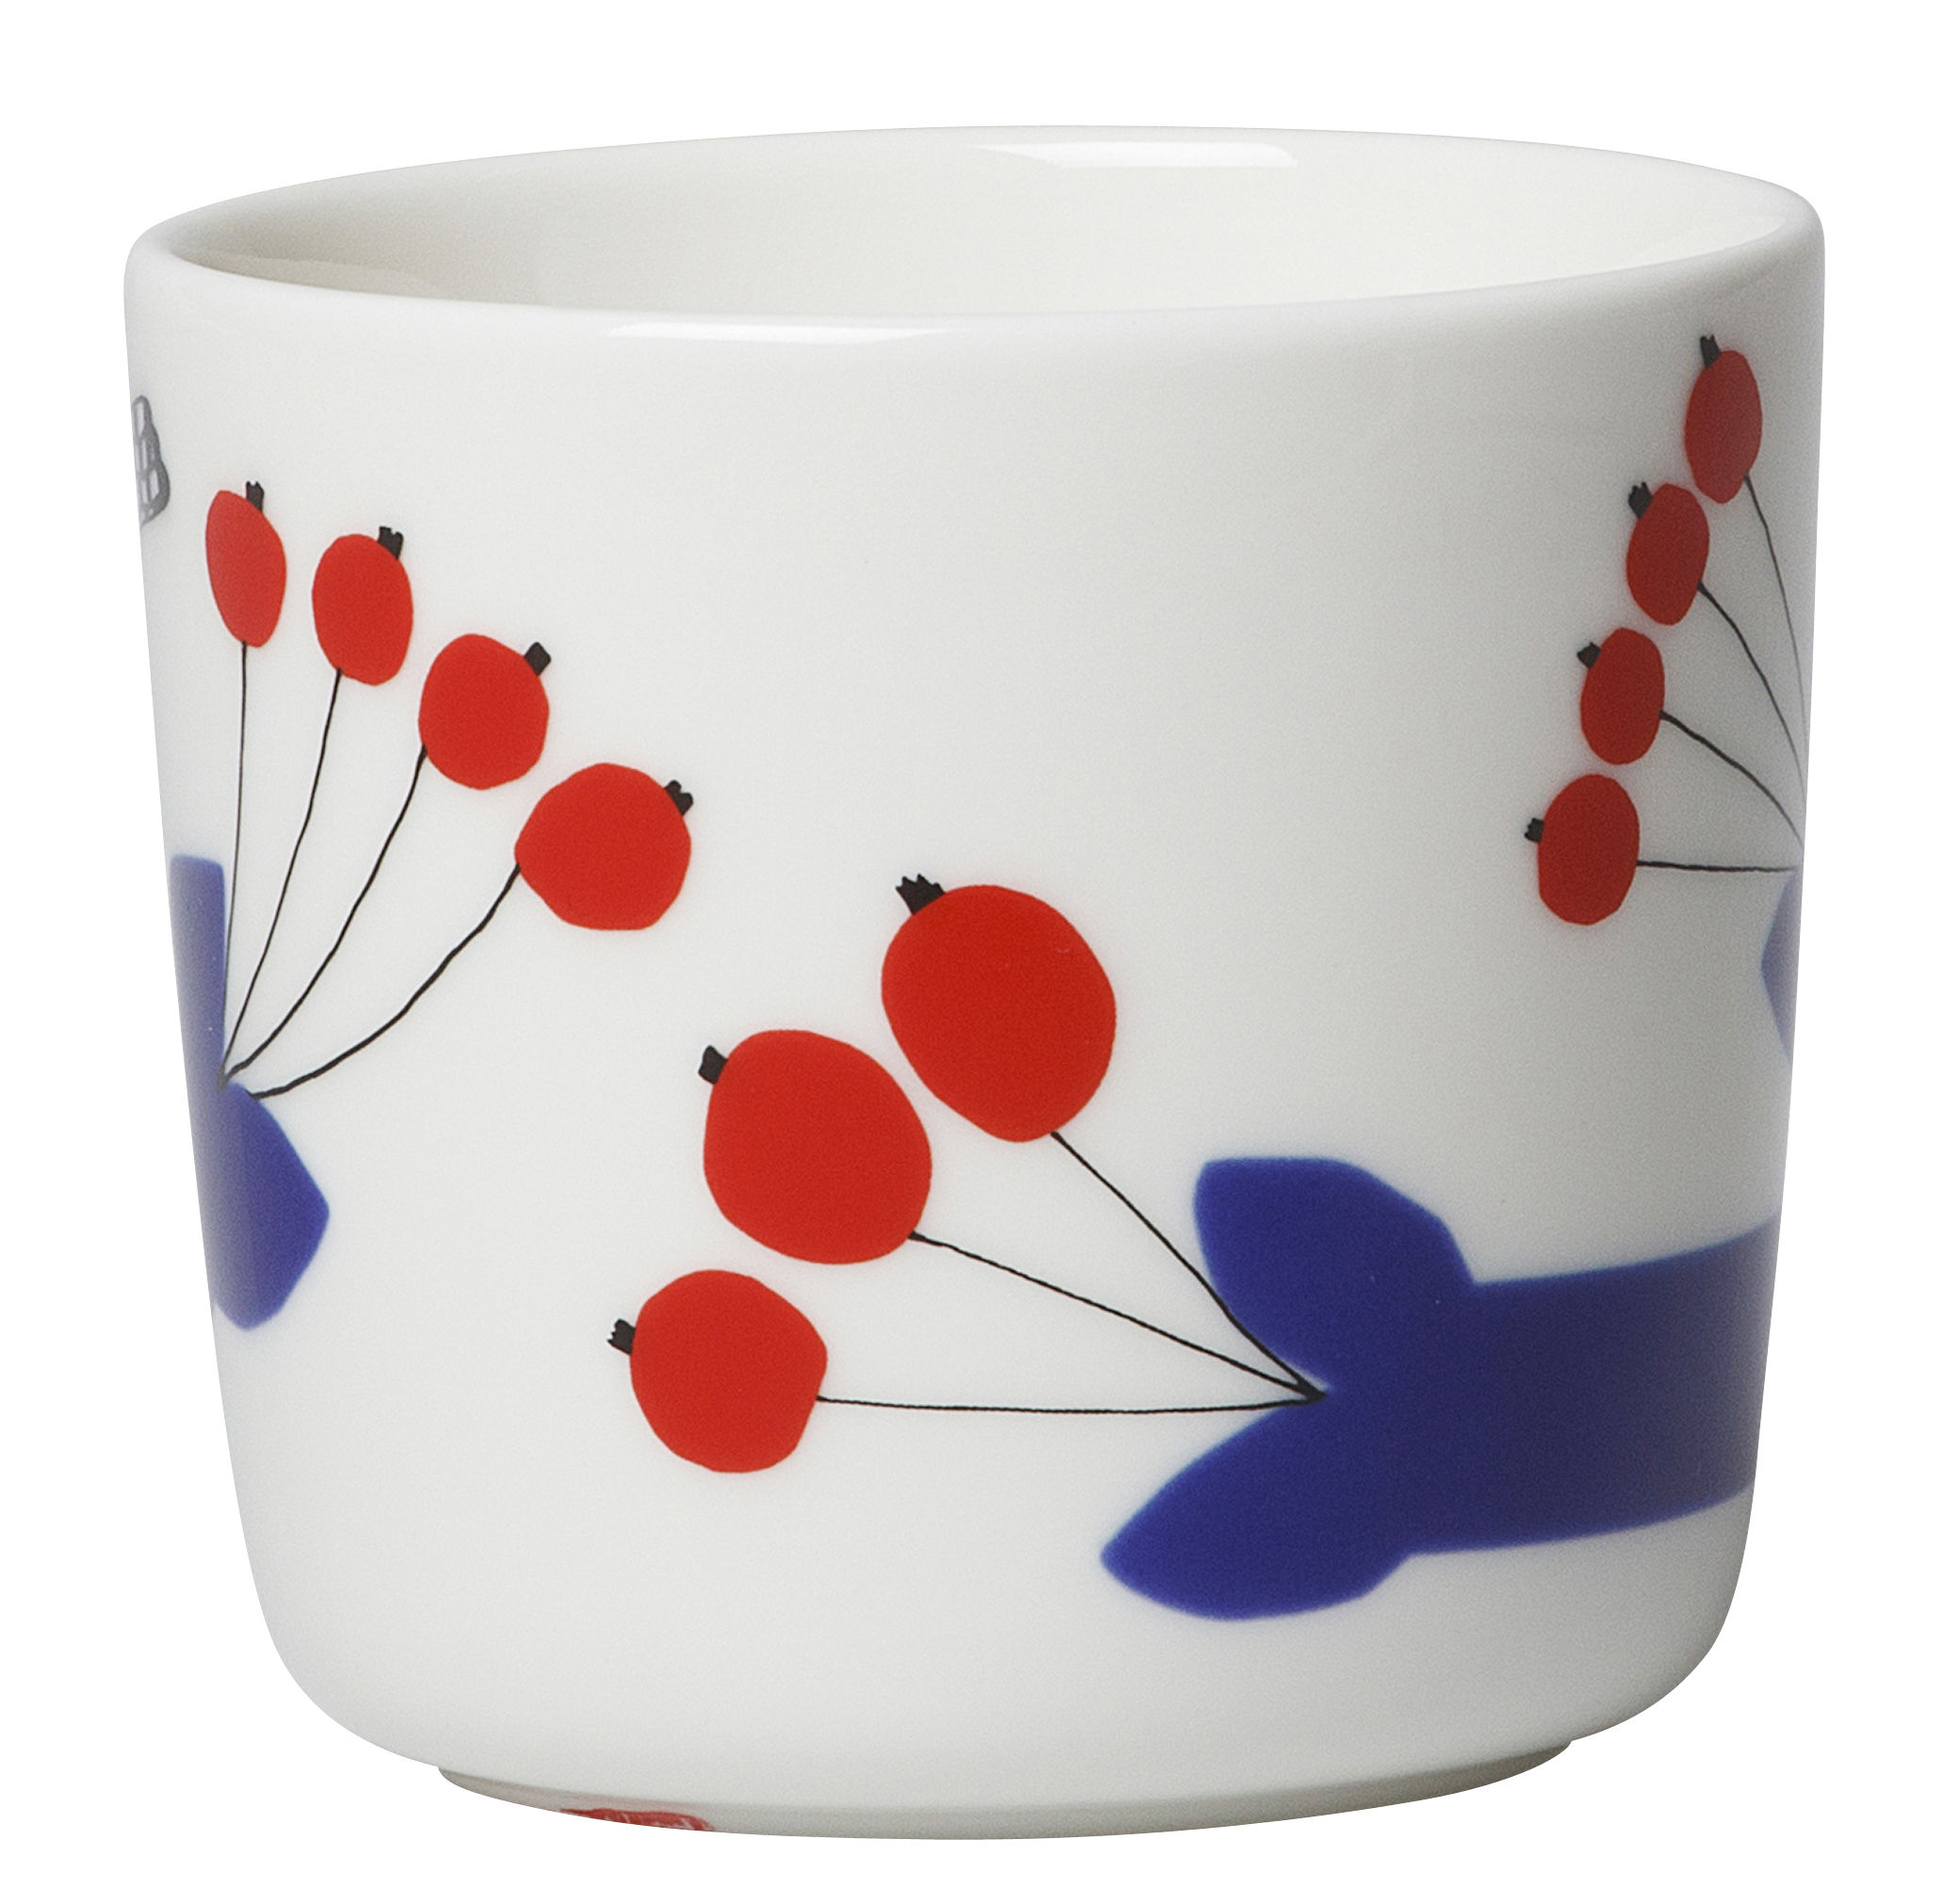 pakkanen kaffeetasse ohne henkel 2er set pakkanen wei blau rot by marimekko made. Black Bedroom Furniture Sets. Home Design Ideas